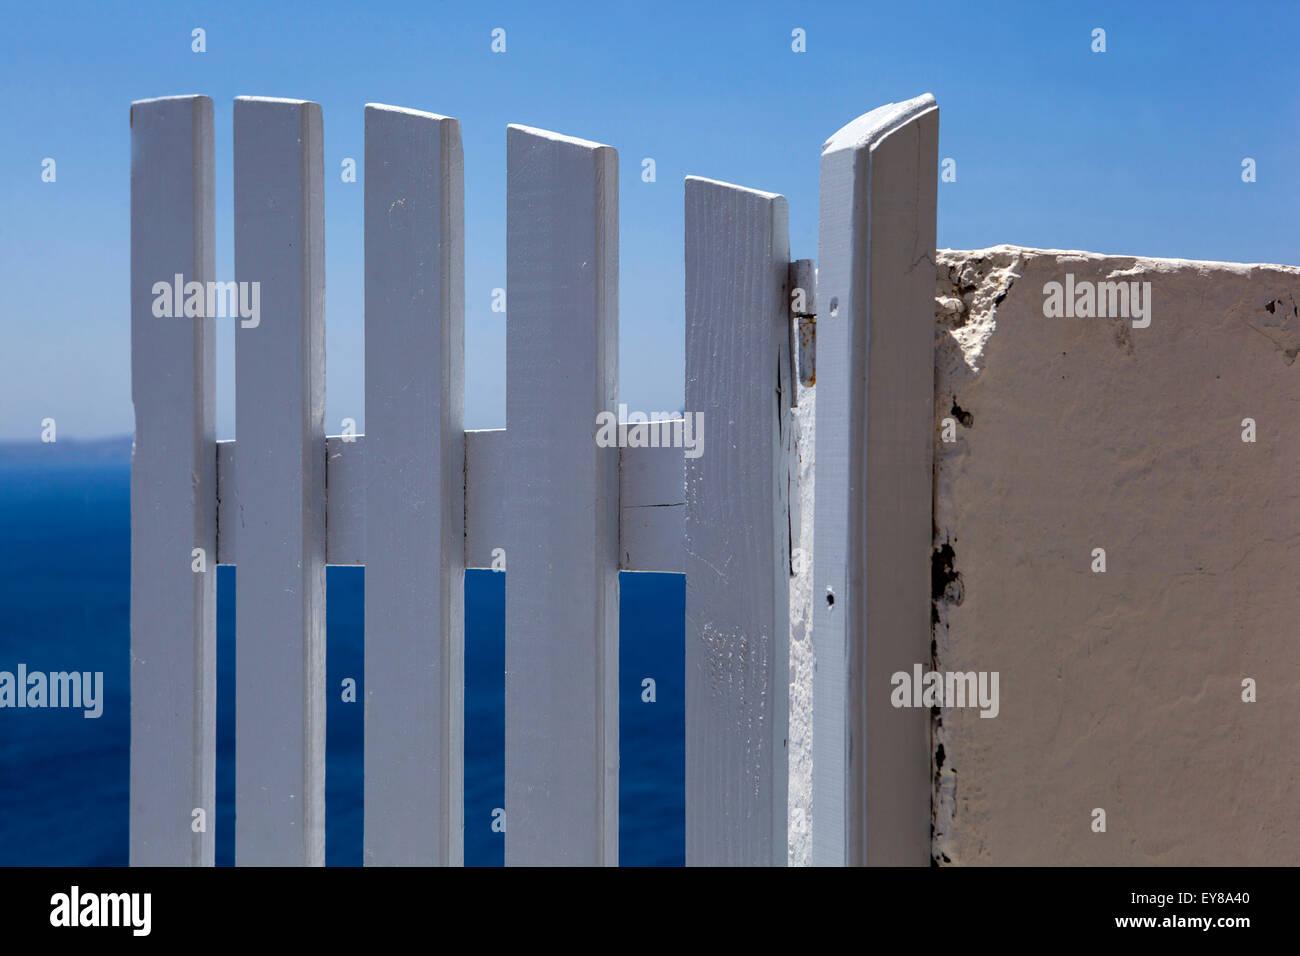 door, Terrace, Santorini, Cyclades Islands, Greece, Europe - Stock Image